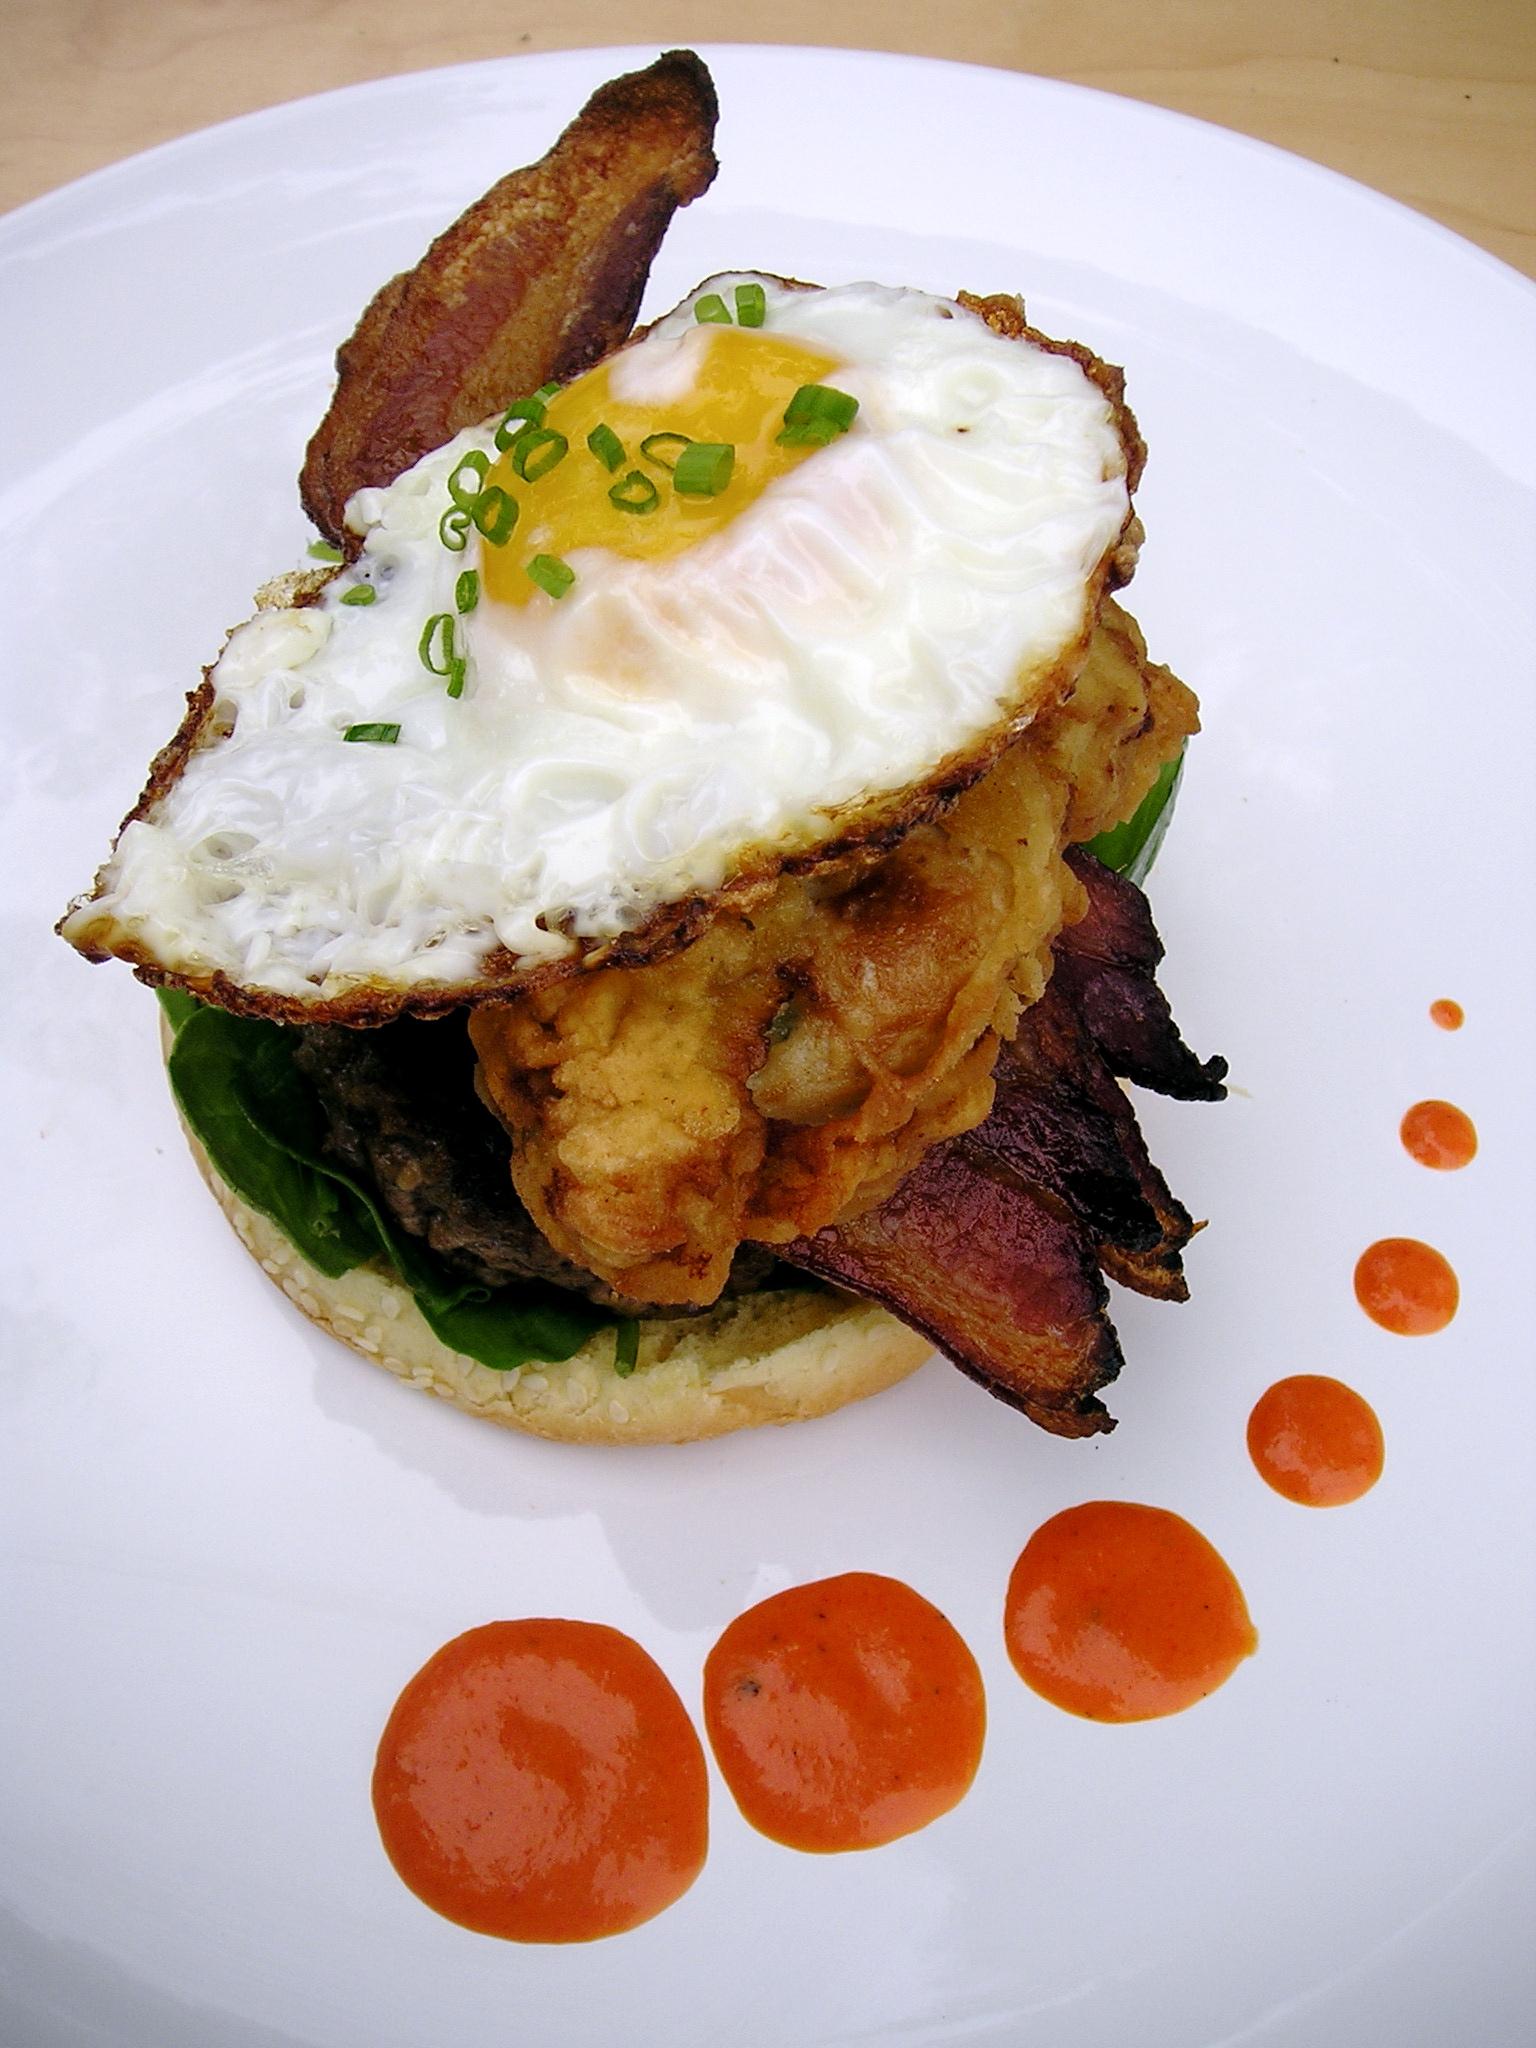 File:Hangtown Burger.jpg - Wikimedia Commons